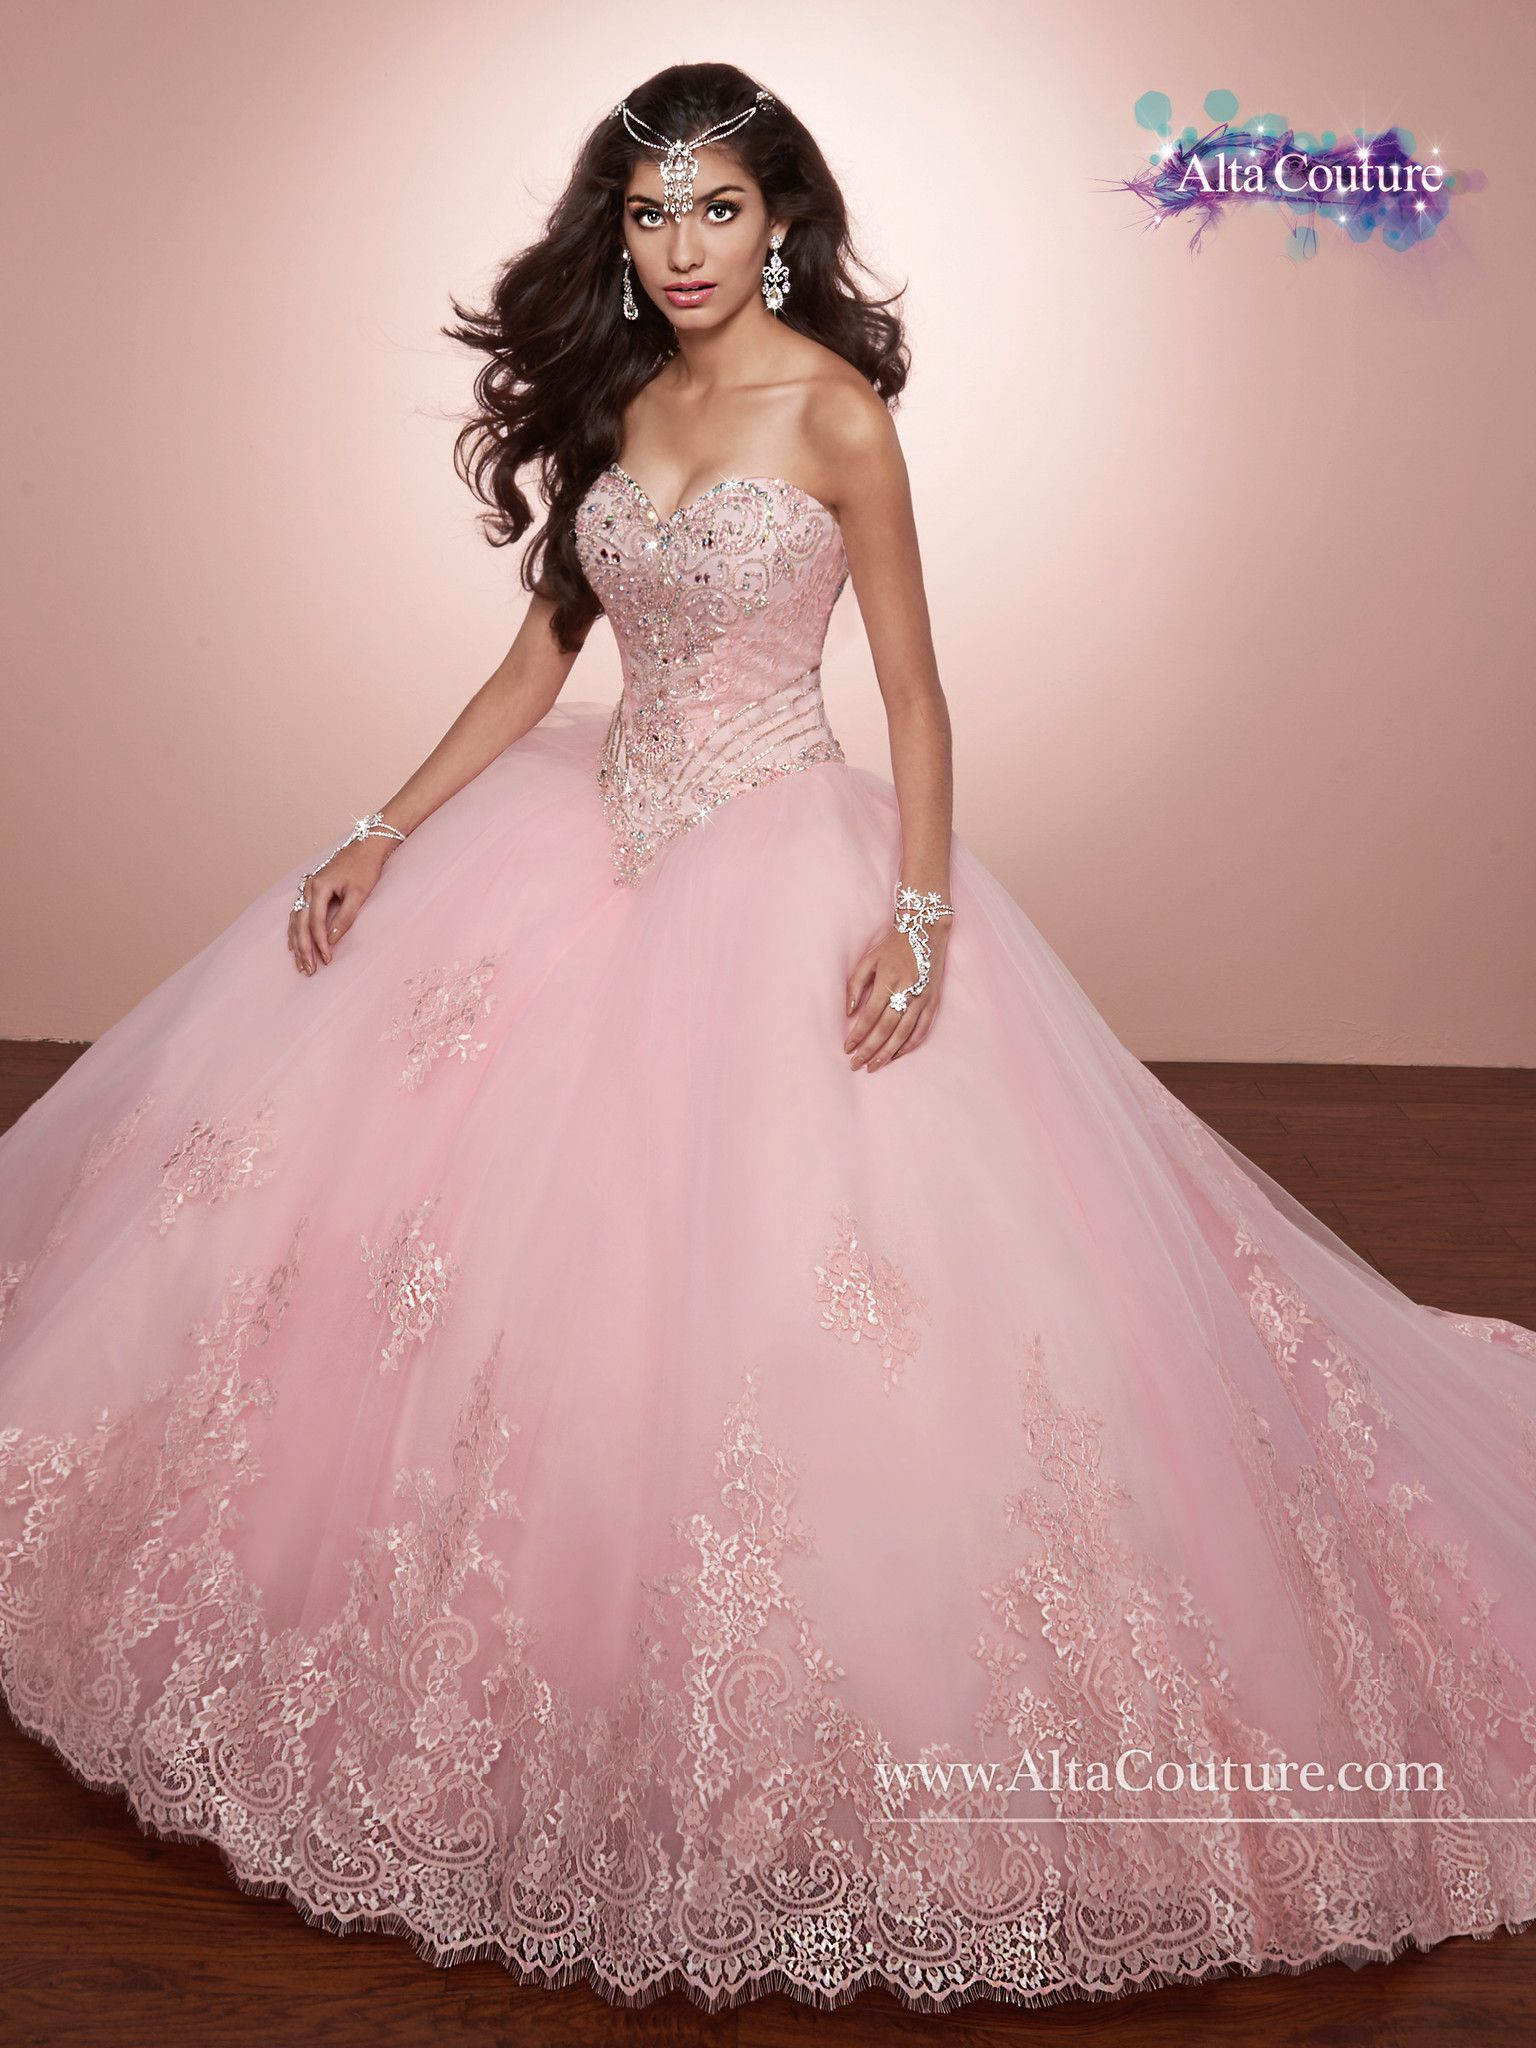 047dbee6438 Mary s Bridal Alta Couture Quinceanera Dress Style 4T171   decoracioncasamiento